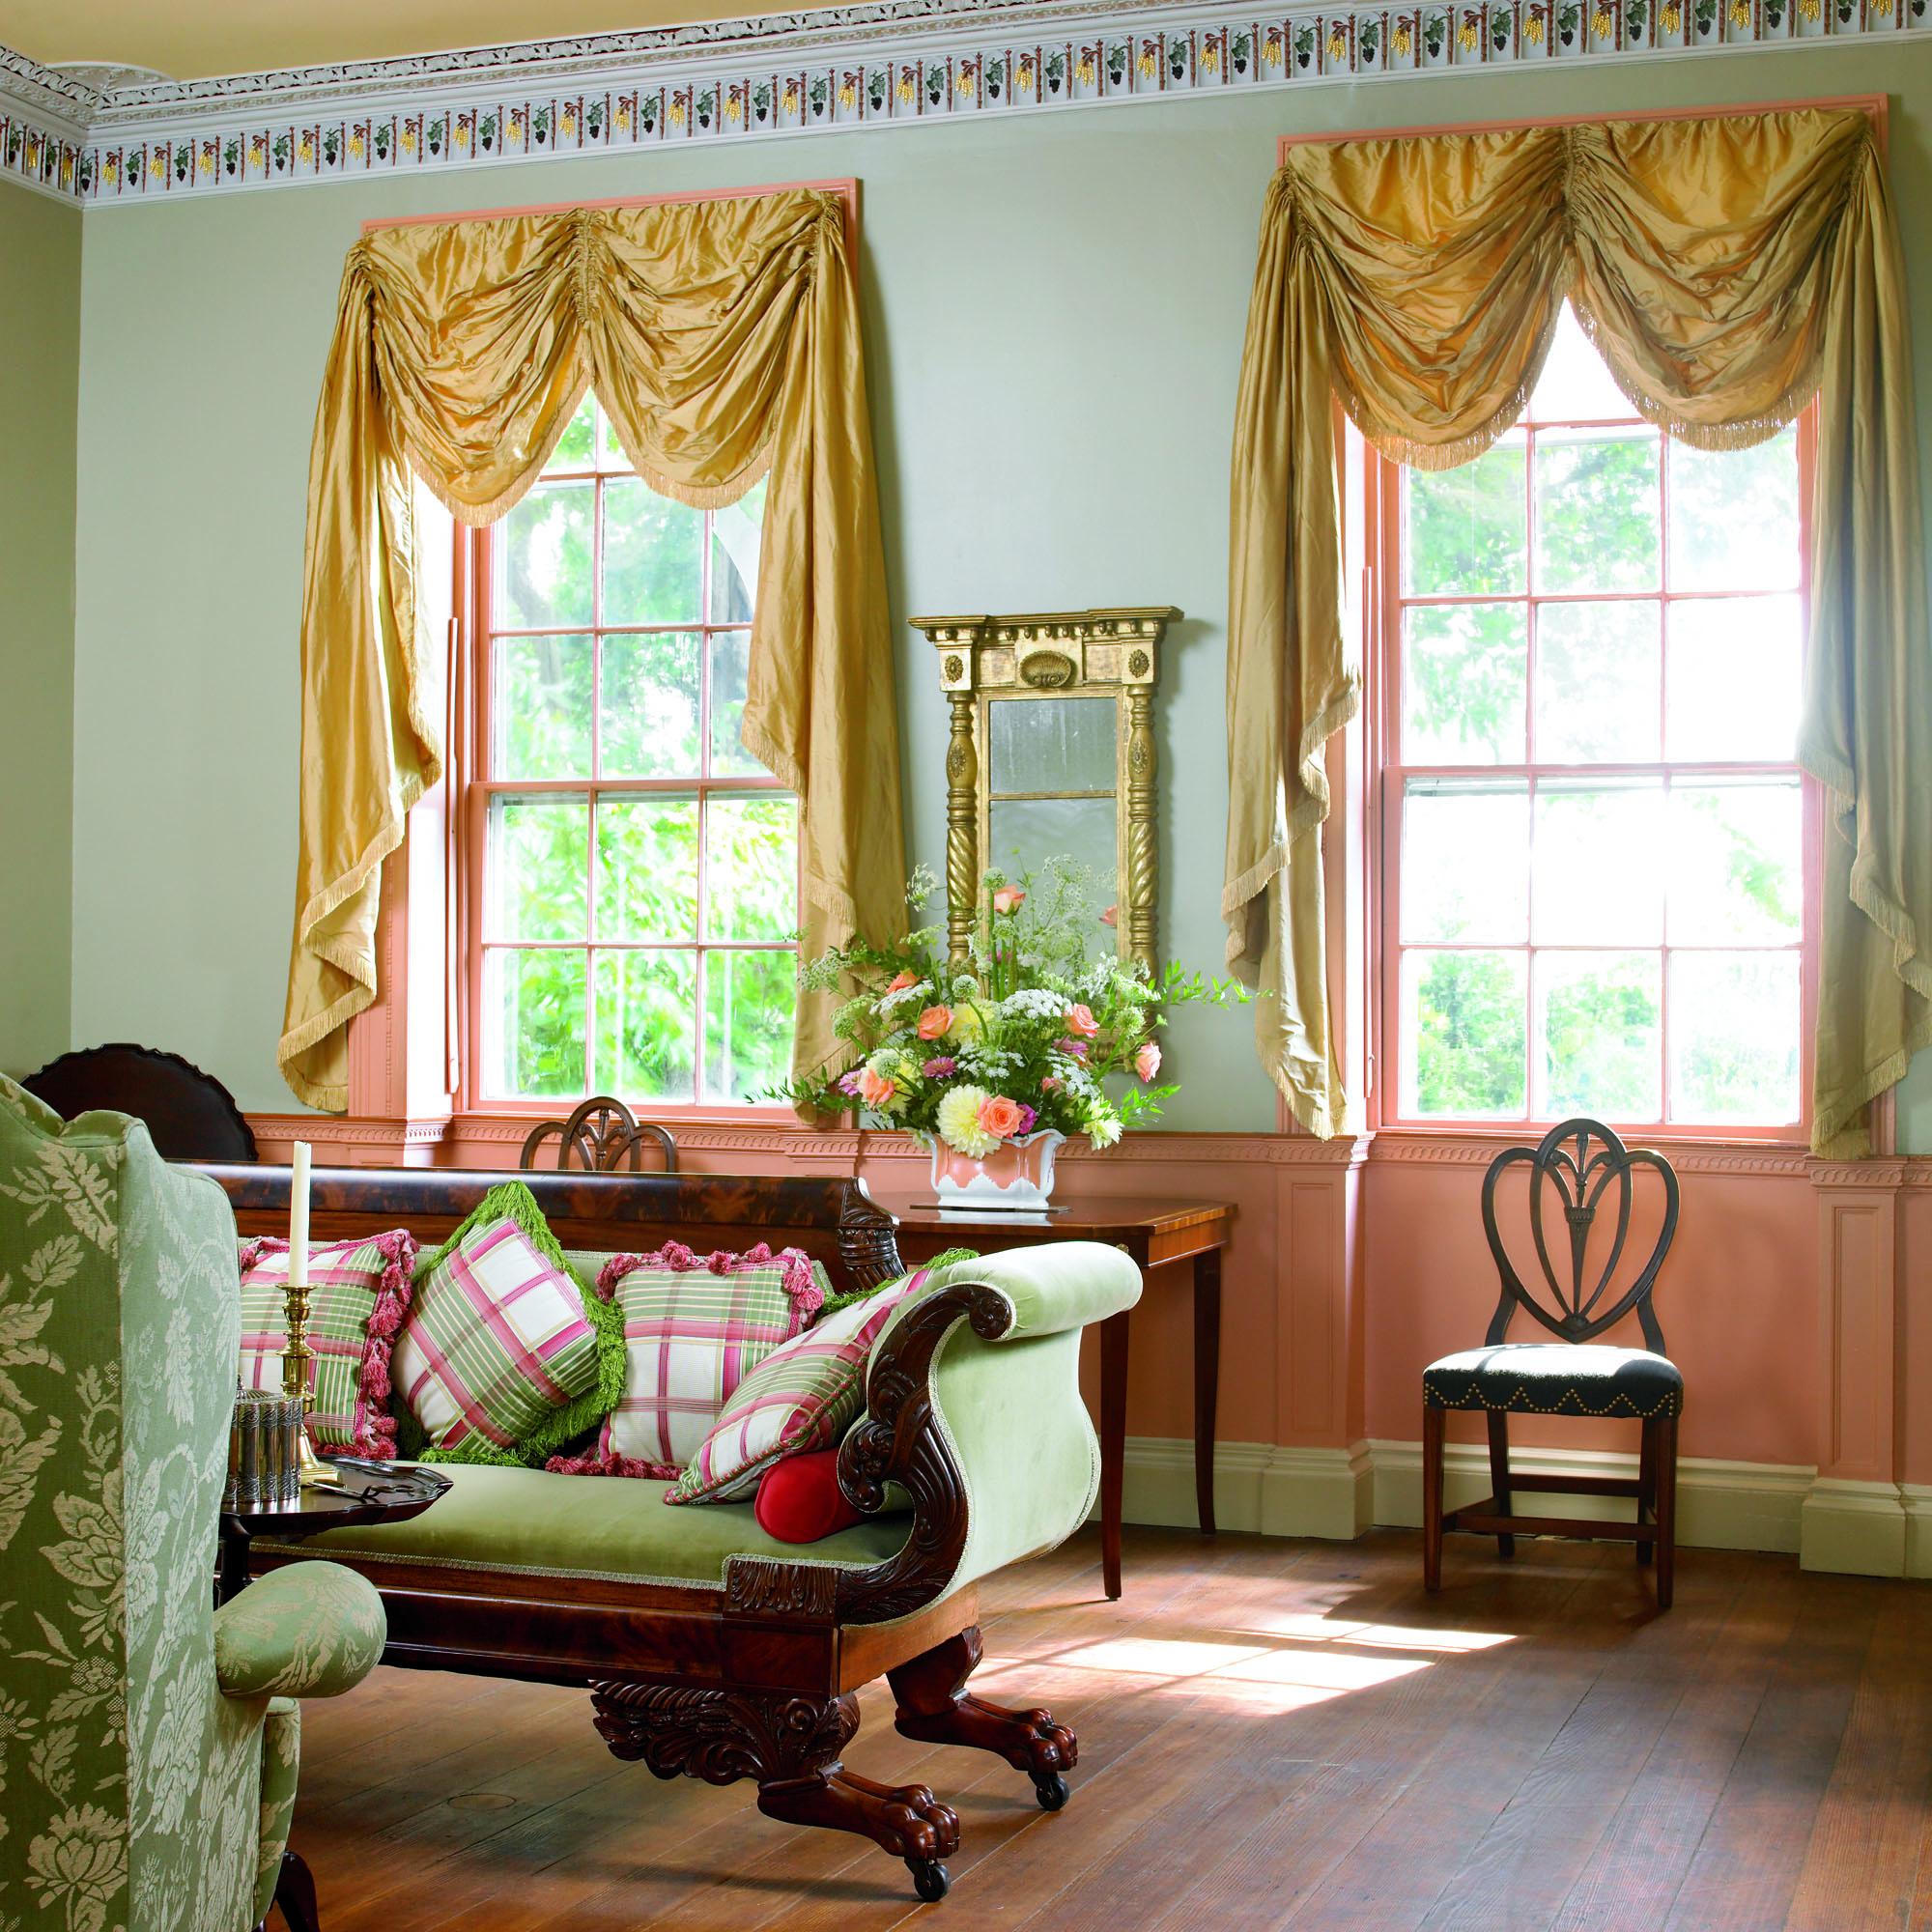 Sitting Pretty: Bench, Settle, Sofa